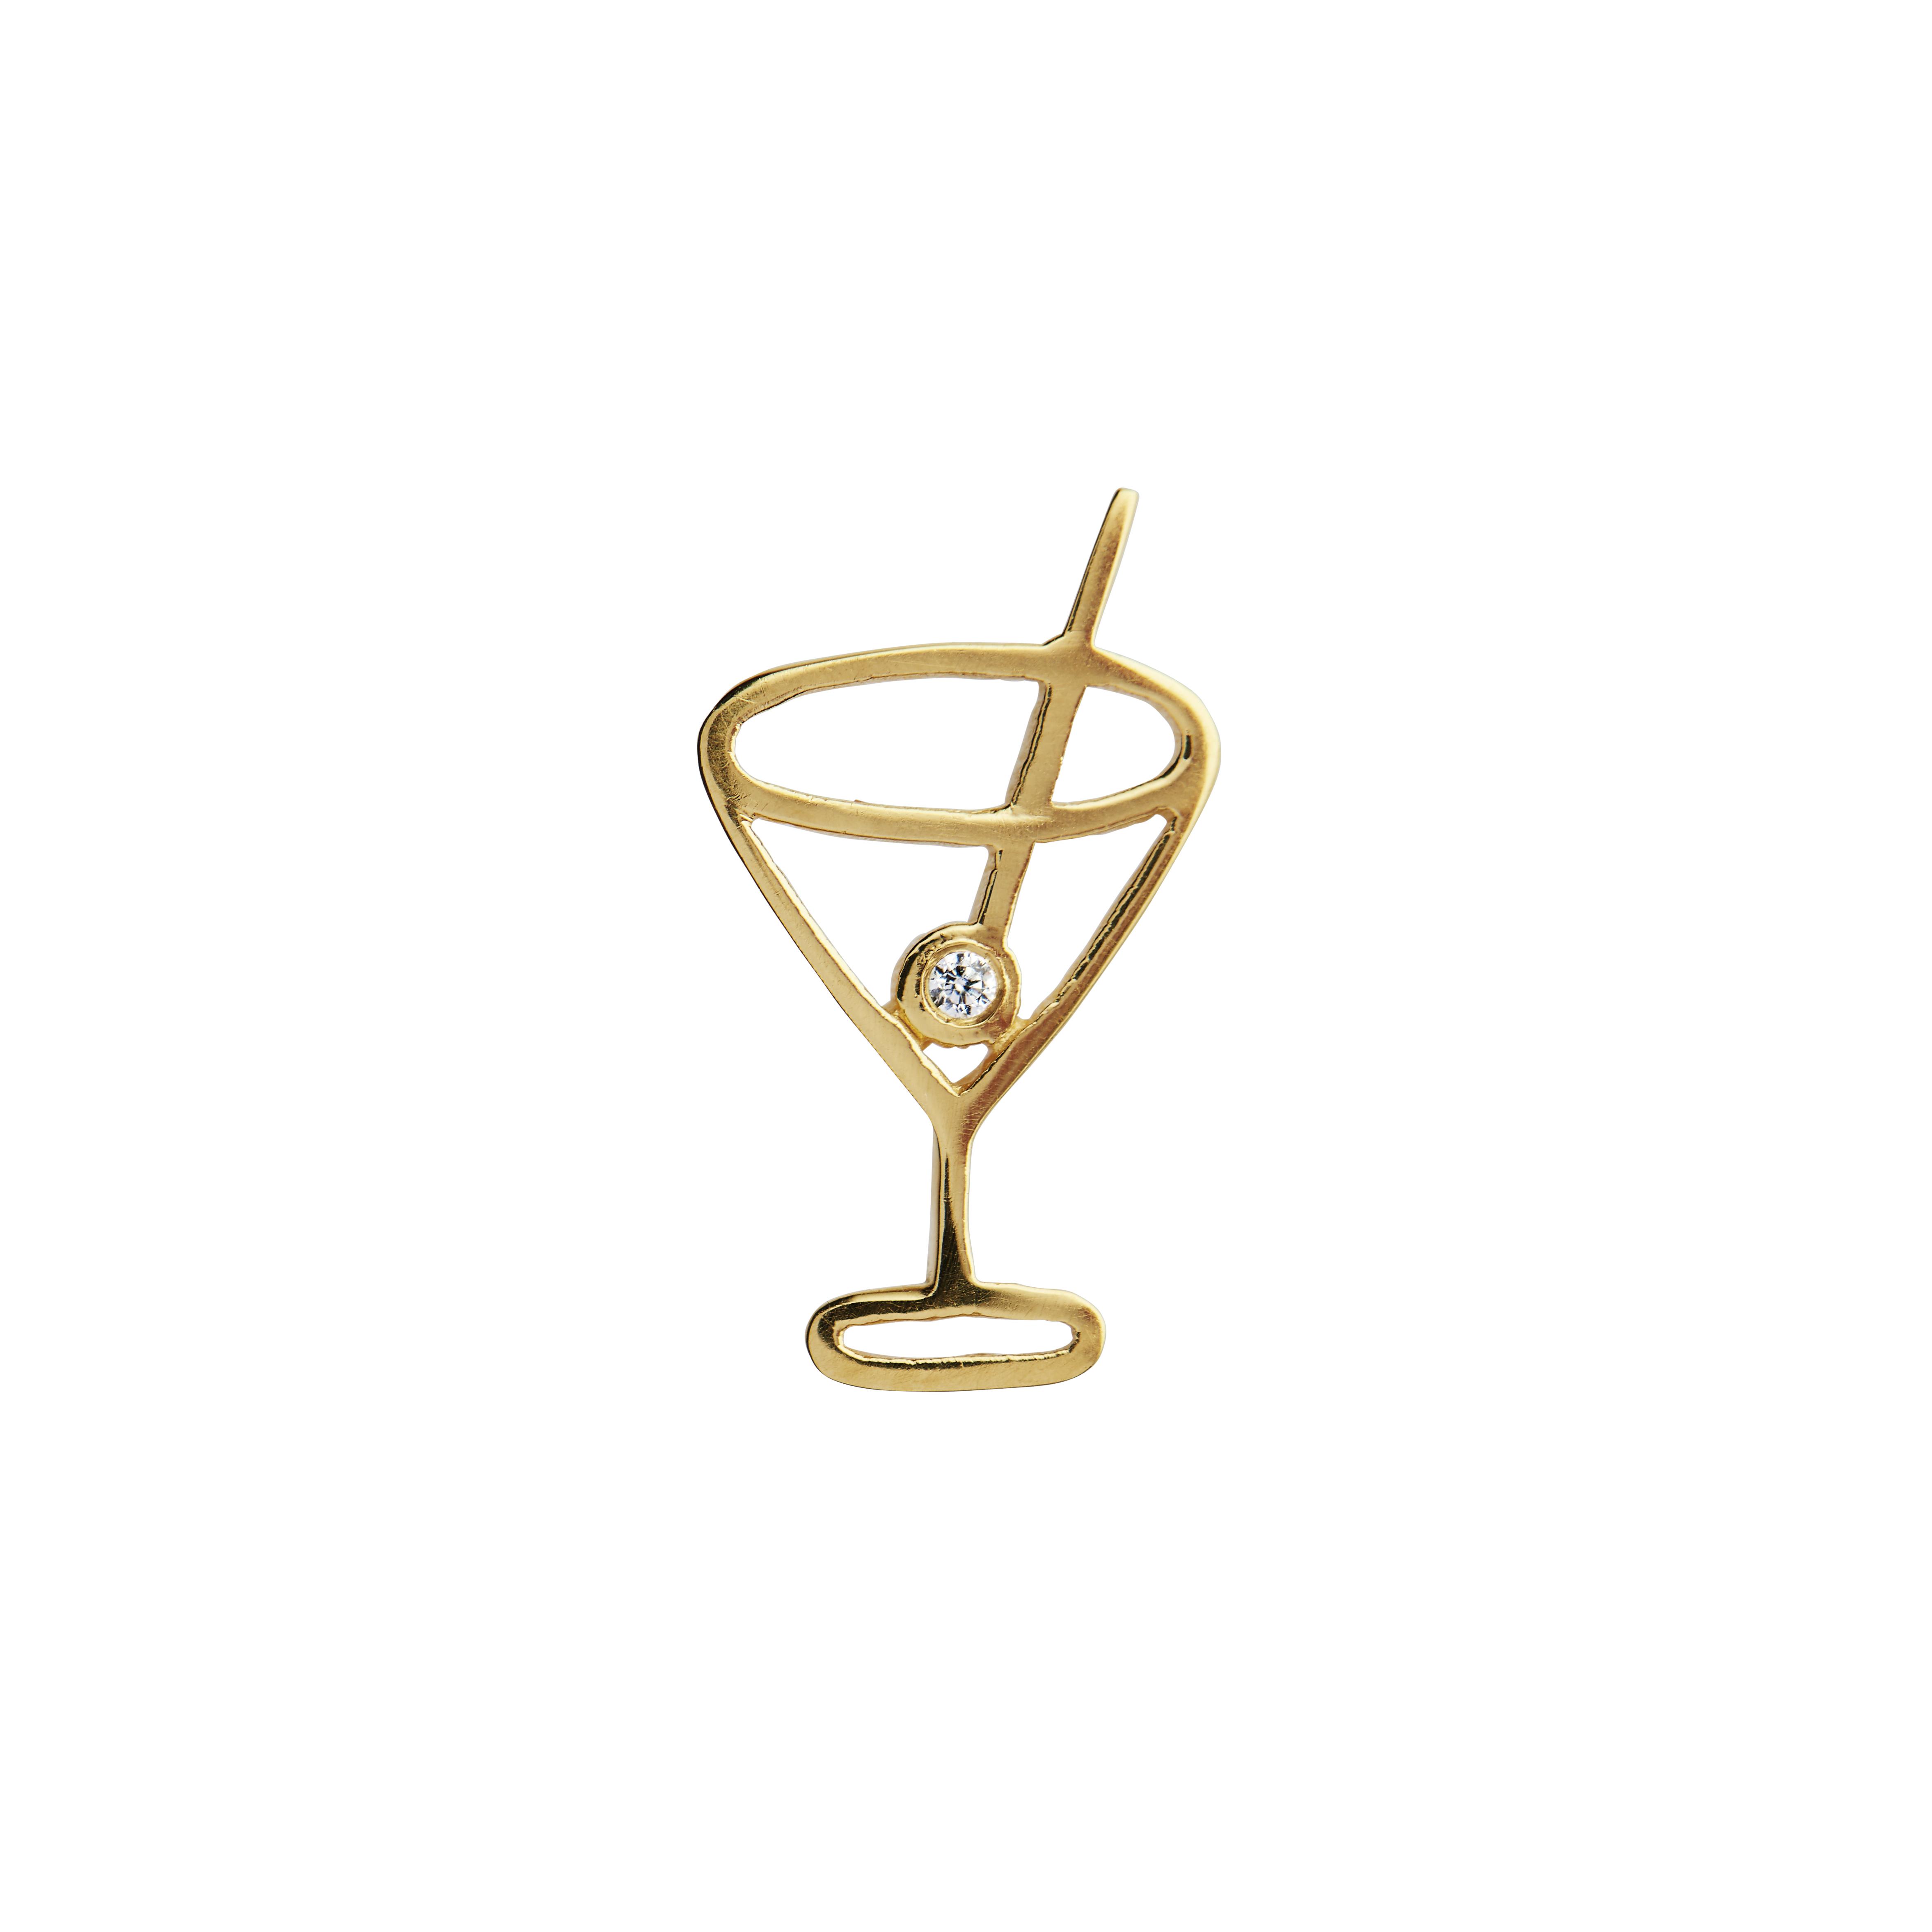 Stine A Petit Cocktail vedhæng, guld